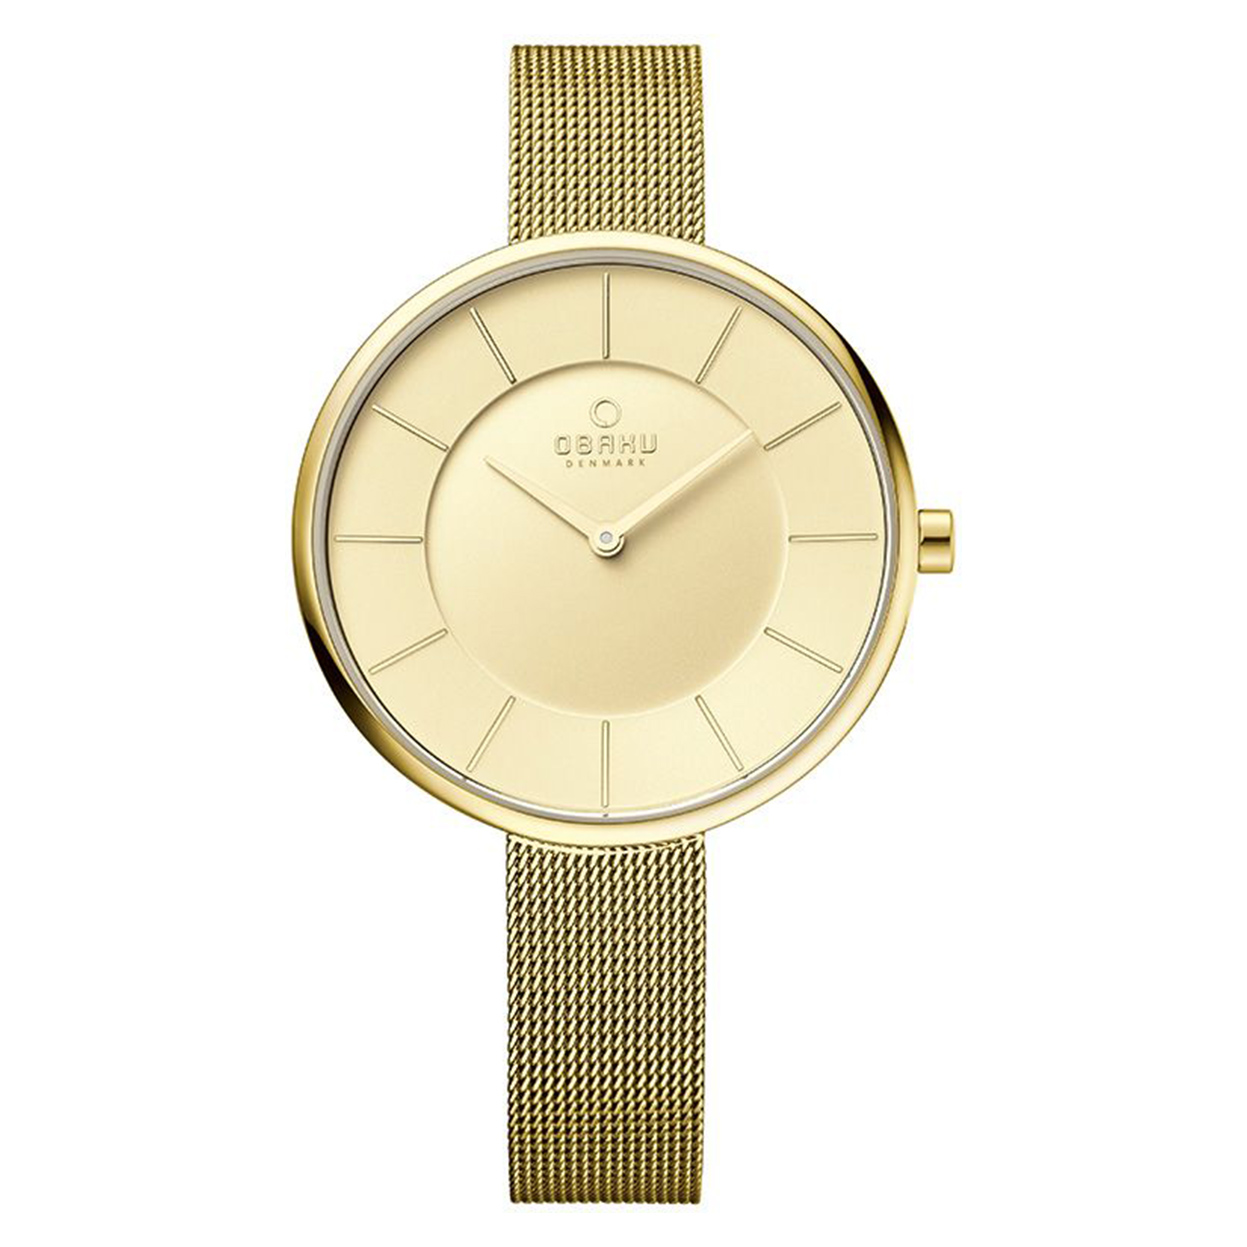 Zegarek Obaku V185LXGGMG - grawer na stalowej kopercie